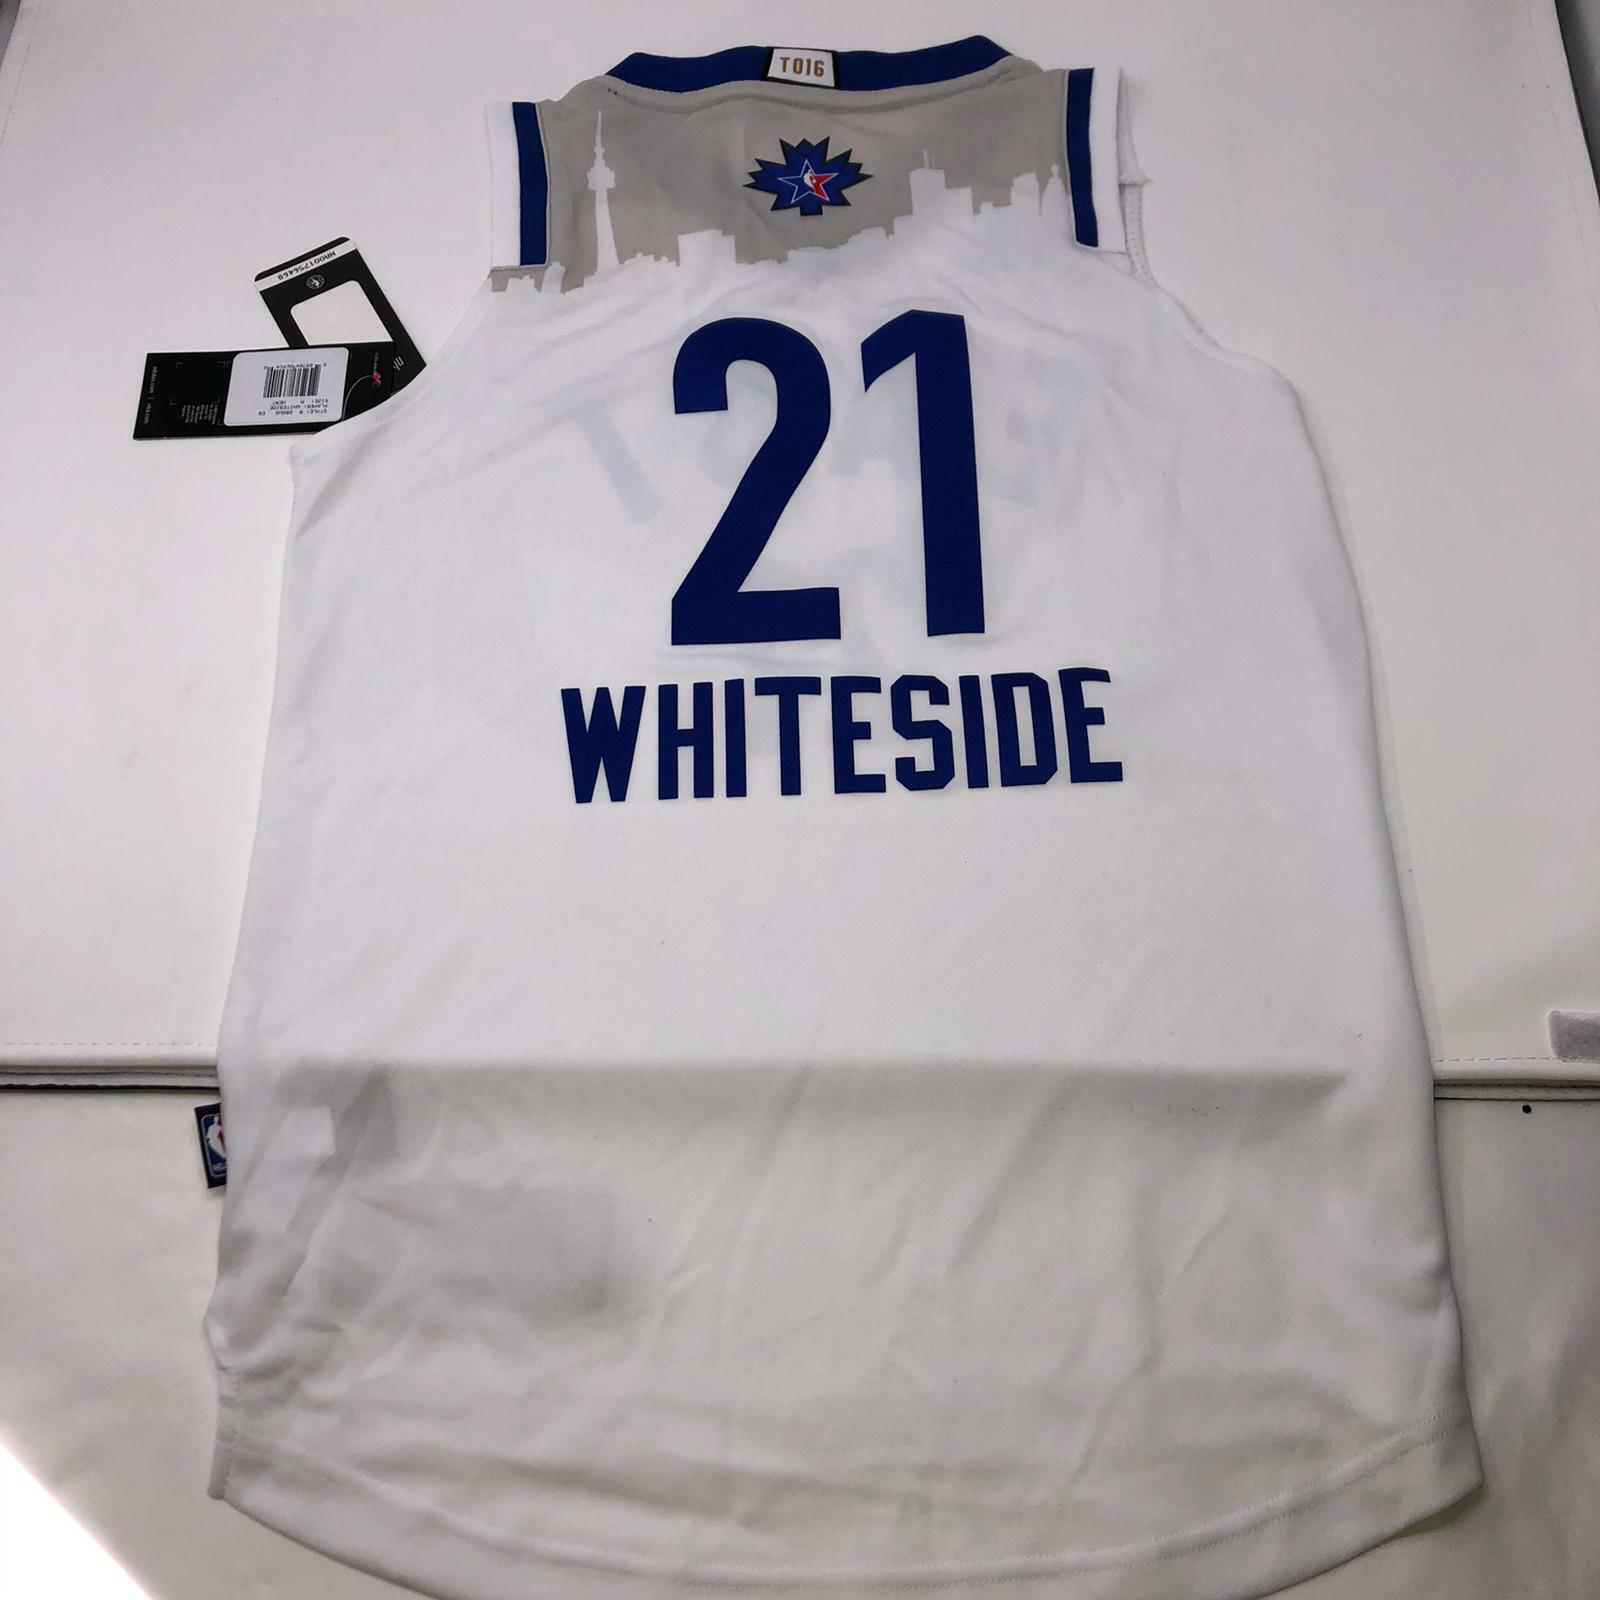 Hassan Whiteside #21 Adidas NBA Toronto All Star Game East J